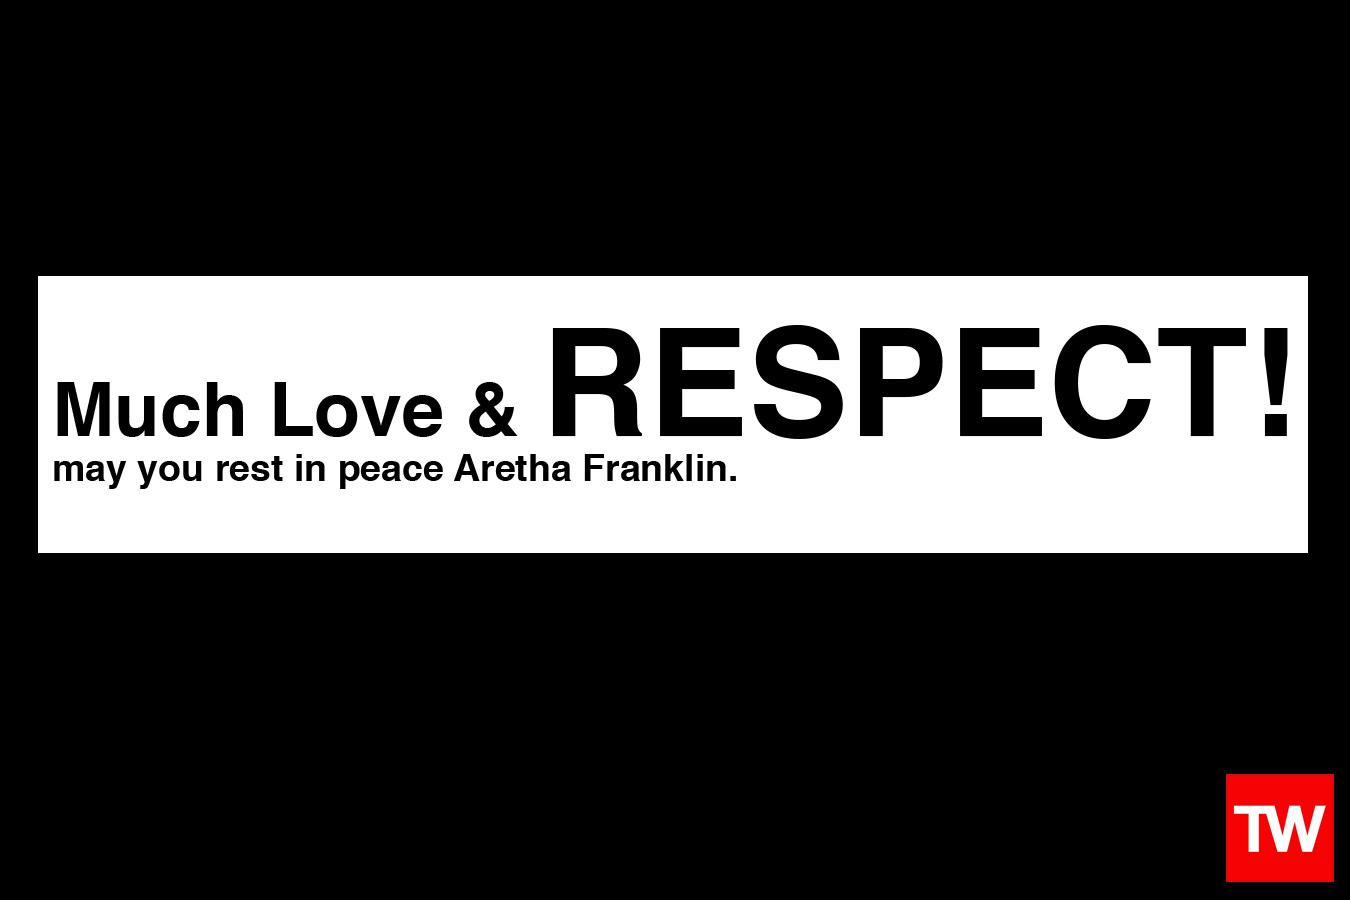 R.I.P. Aretha Franklin